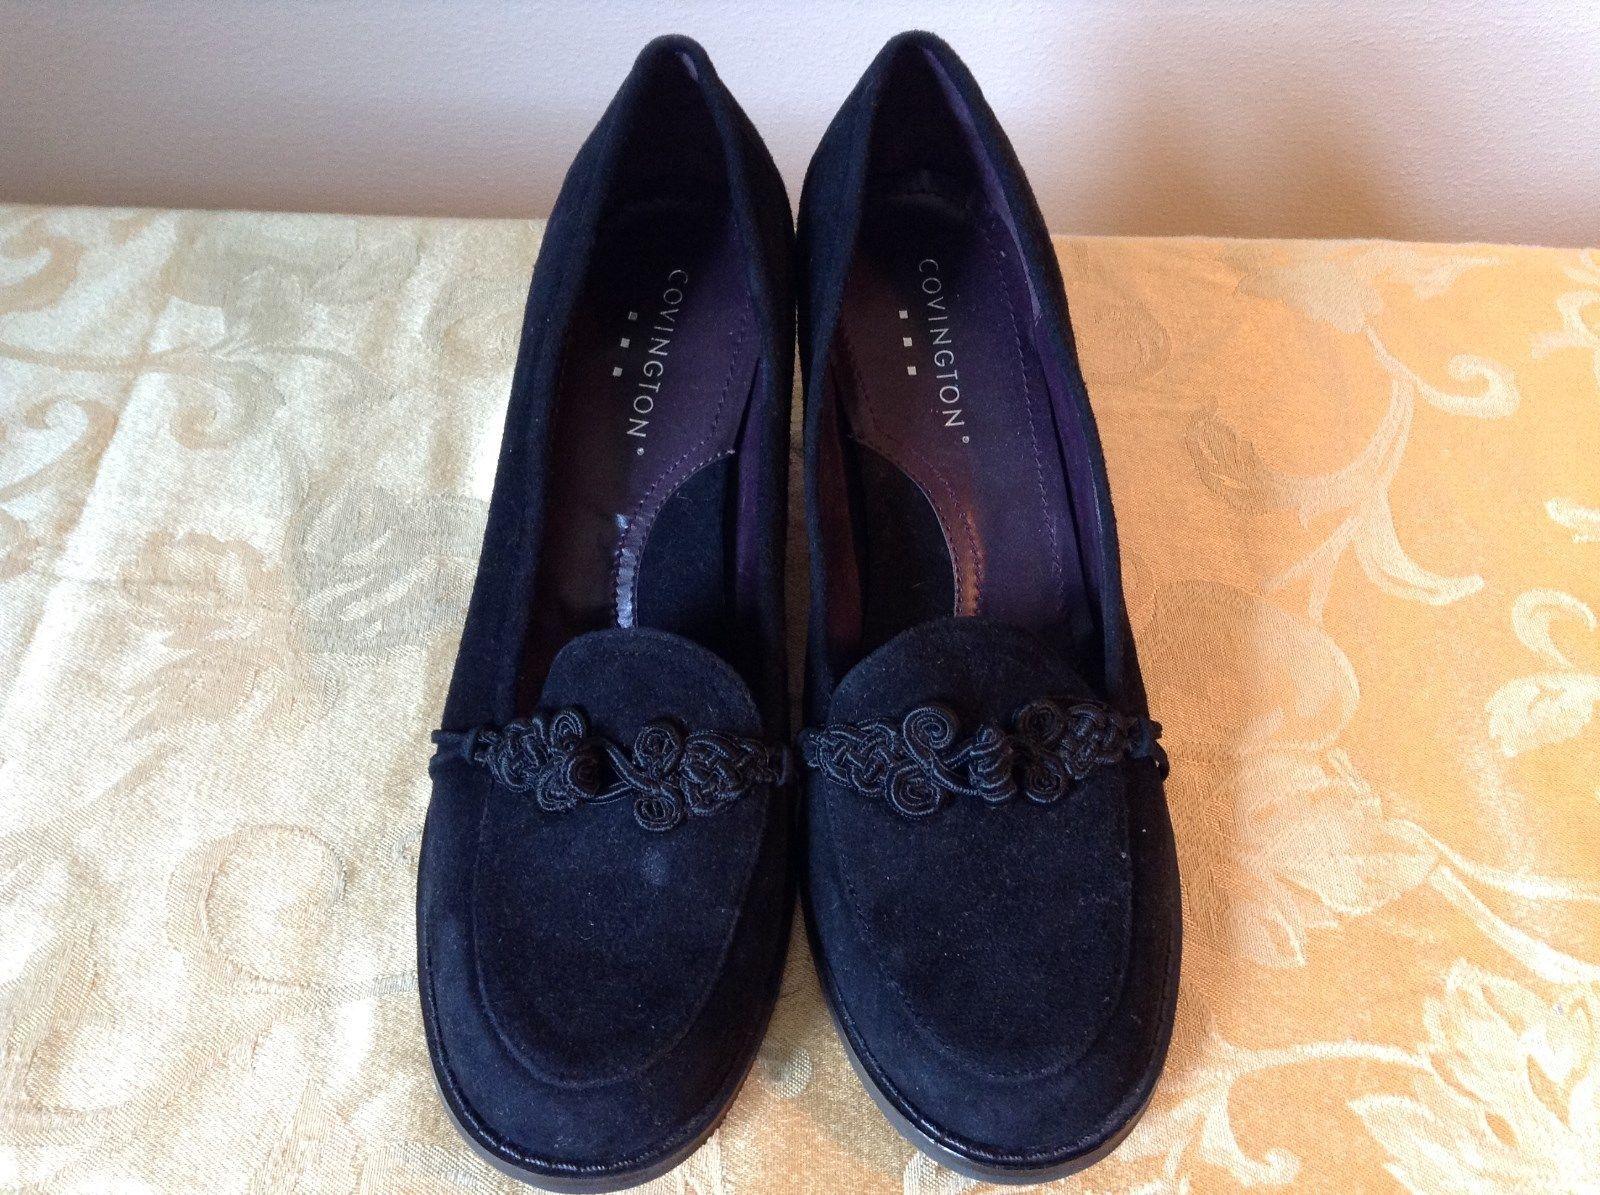 Covington Closed Toe Black Heels Size 9M